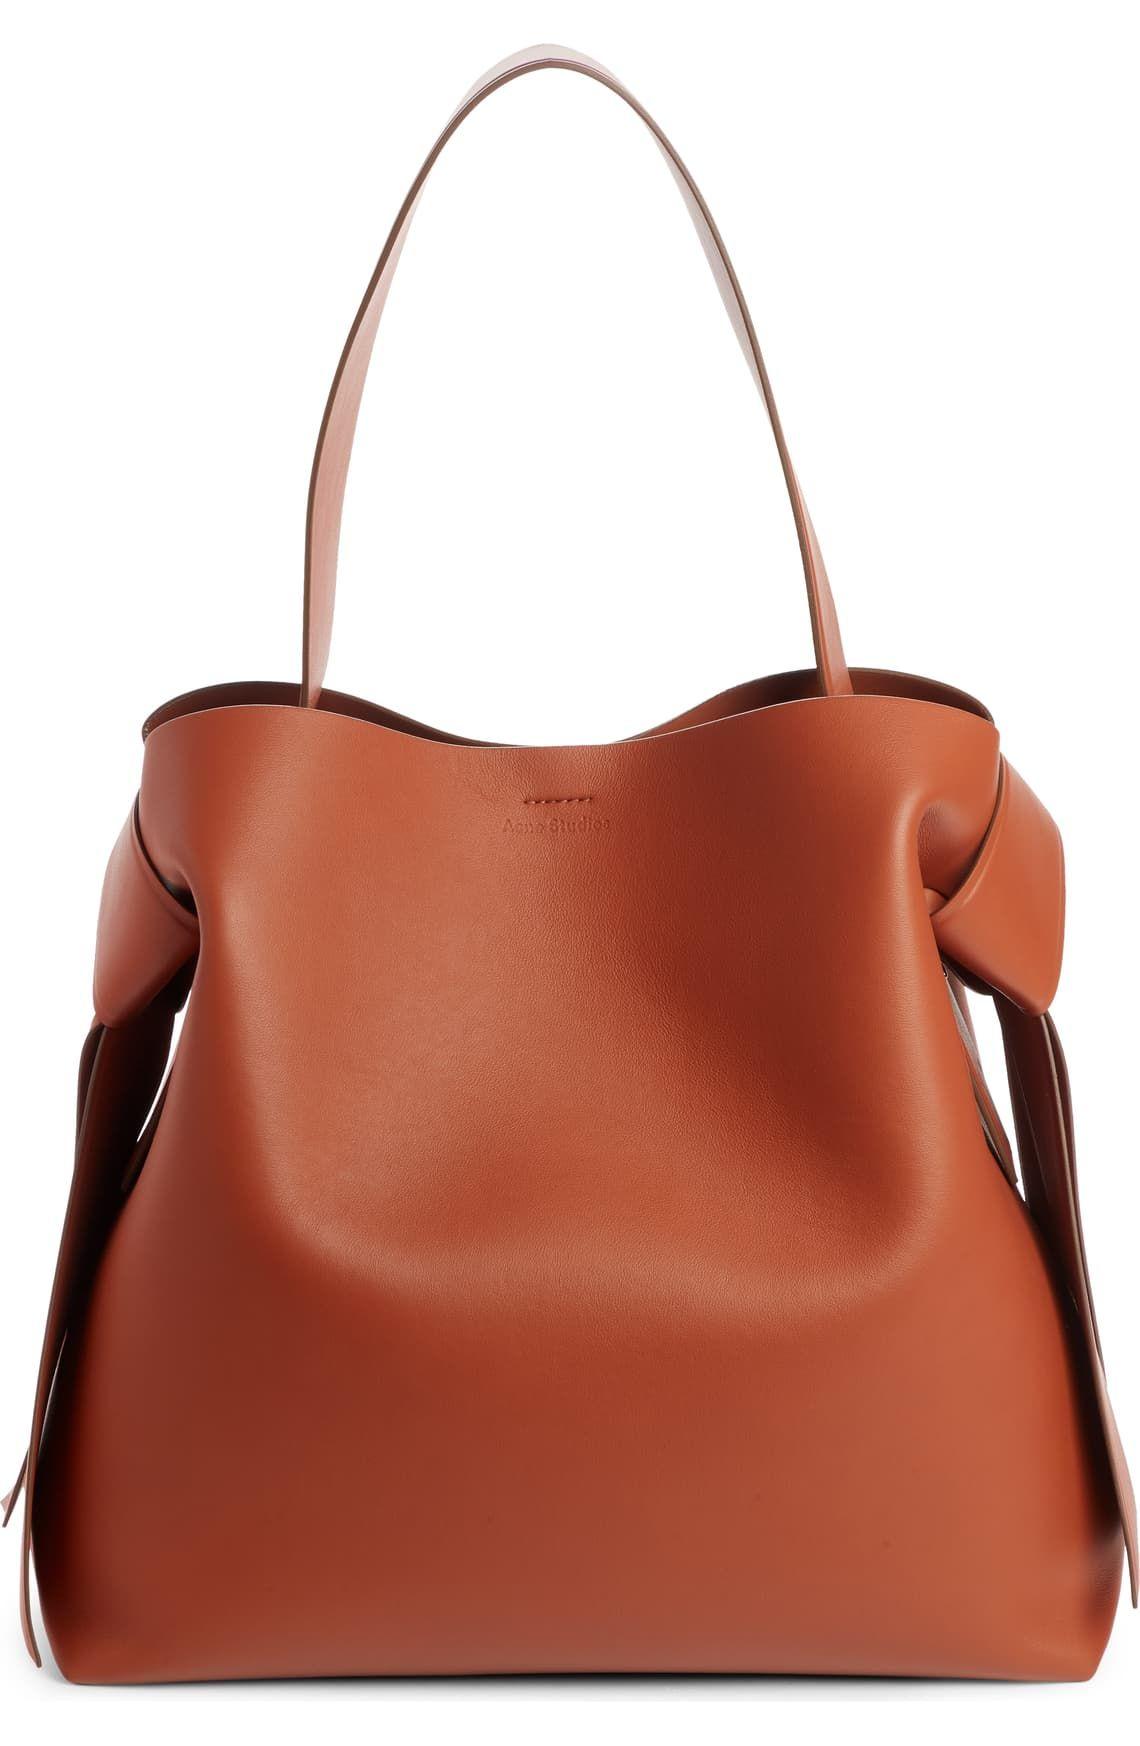 Musubi Leather Maxi bag - for minimalists